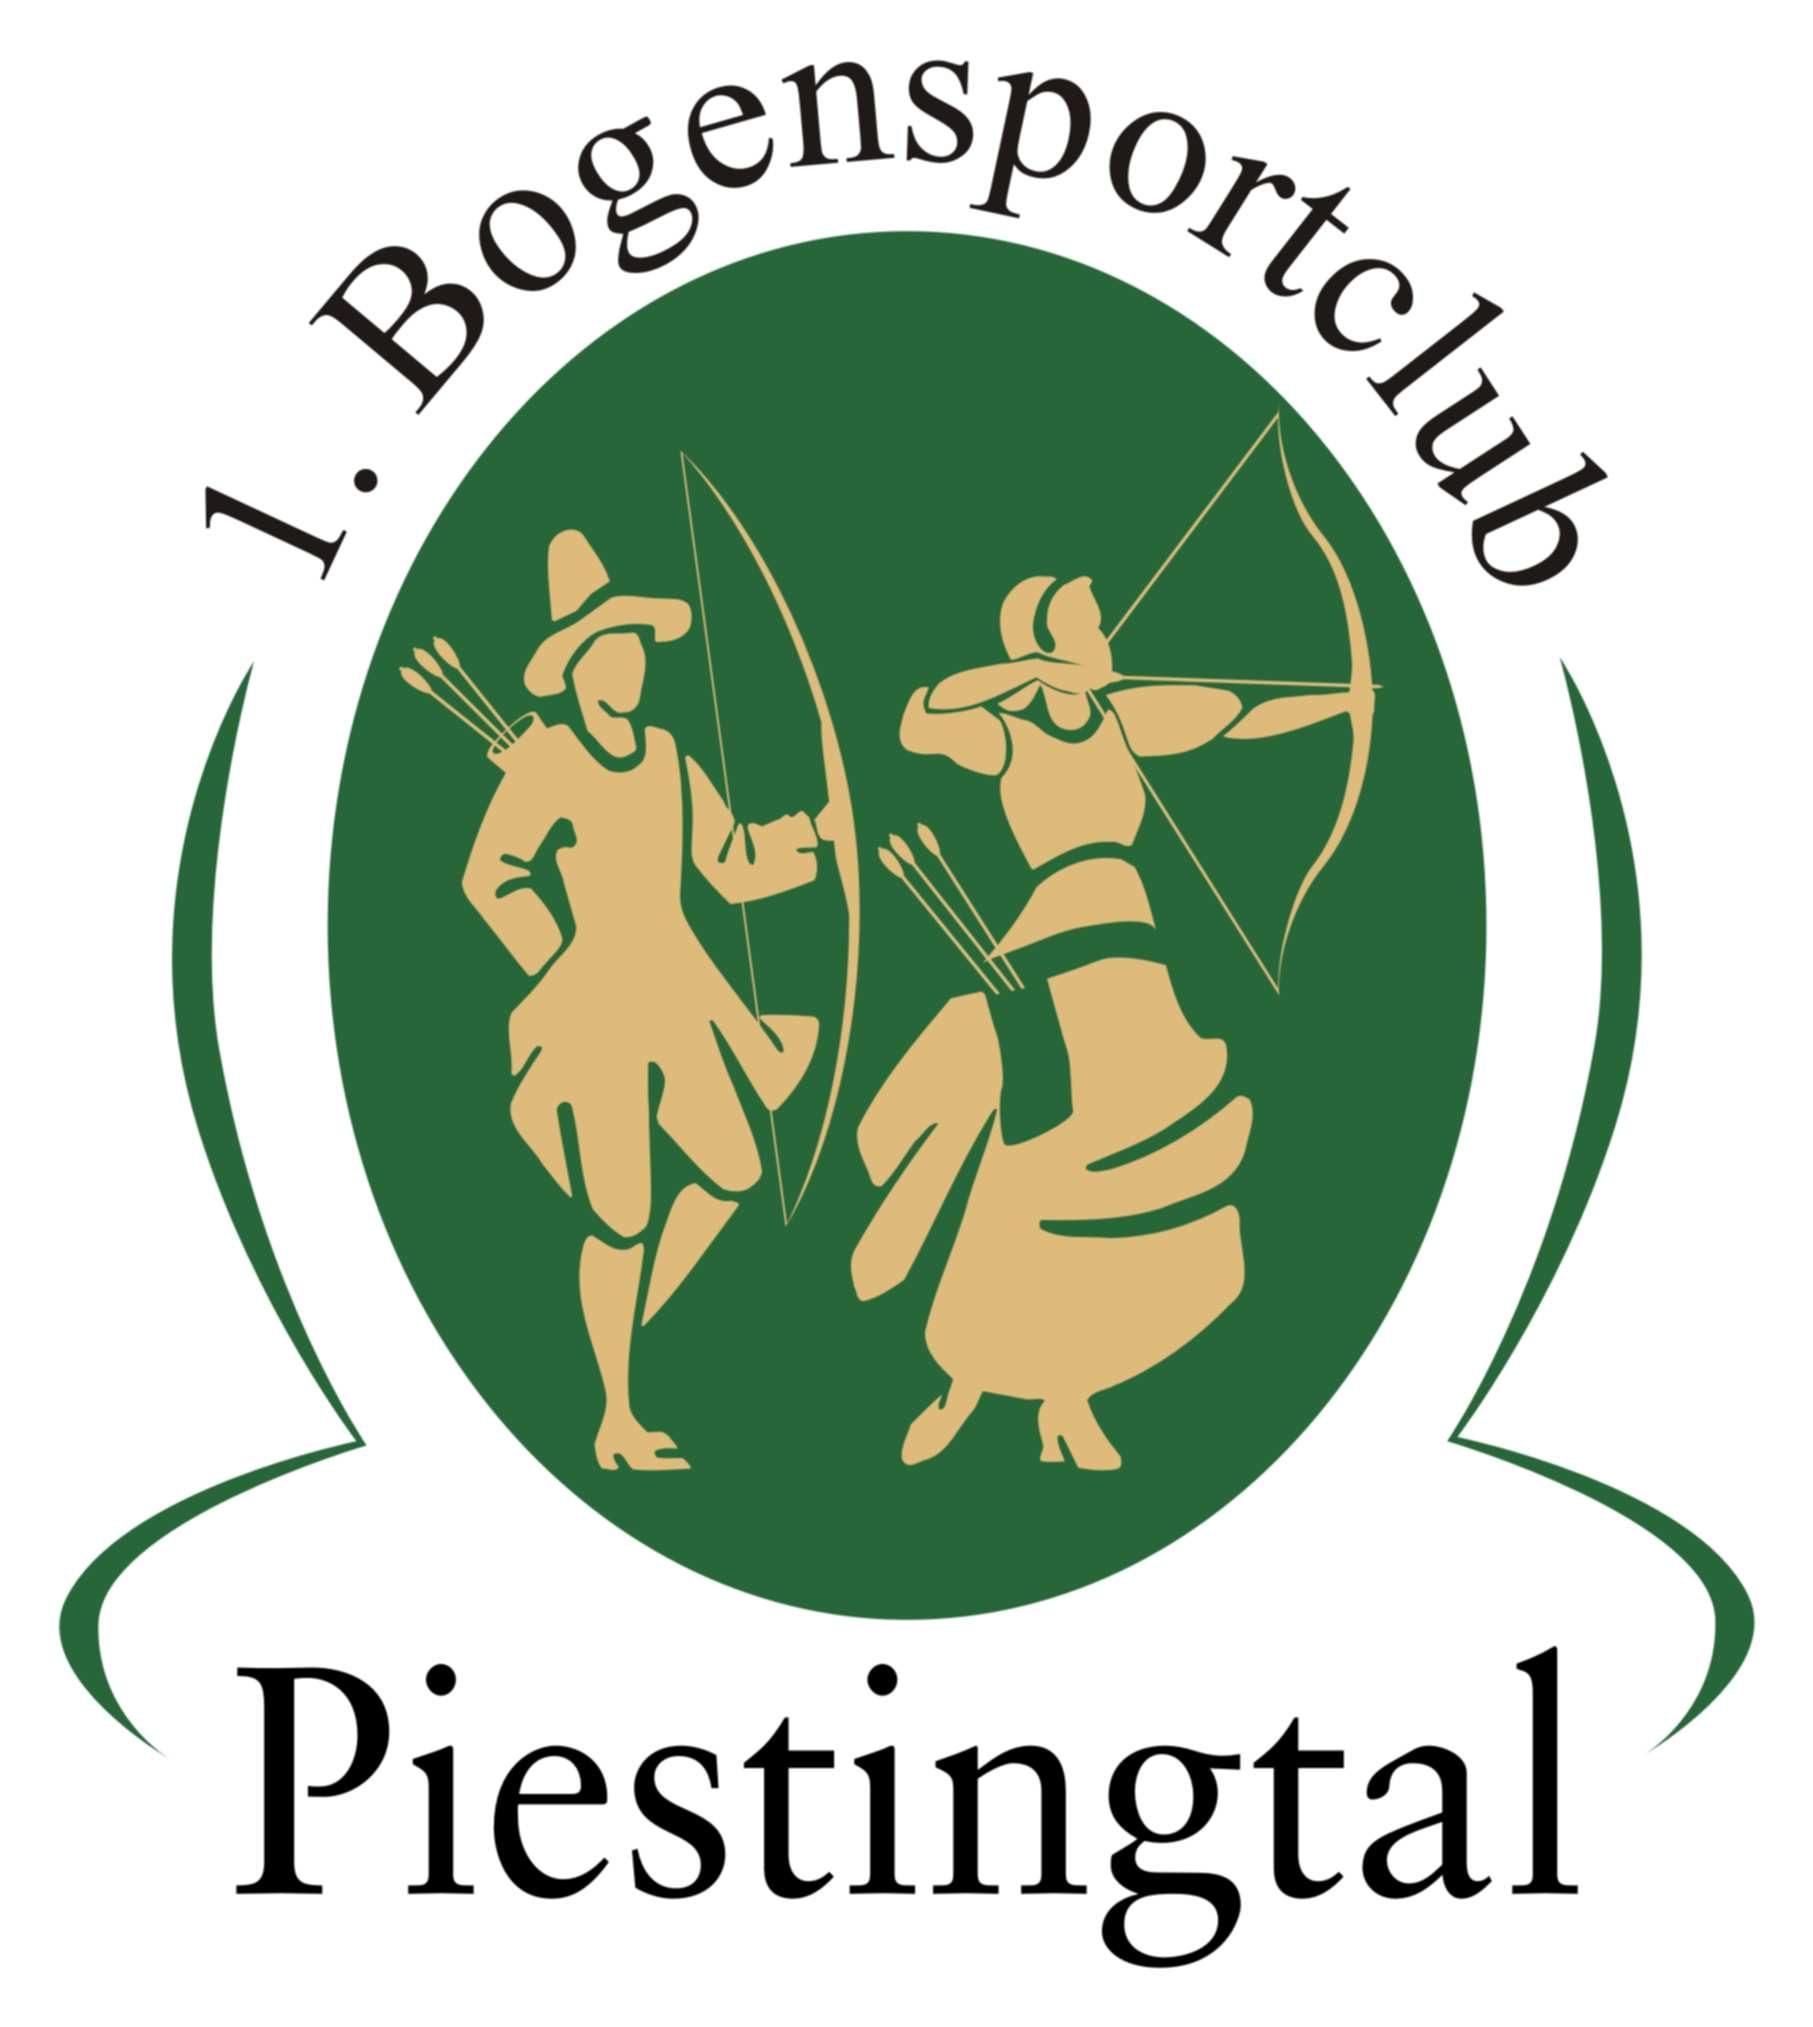 1 Bogensportclub piestingtal